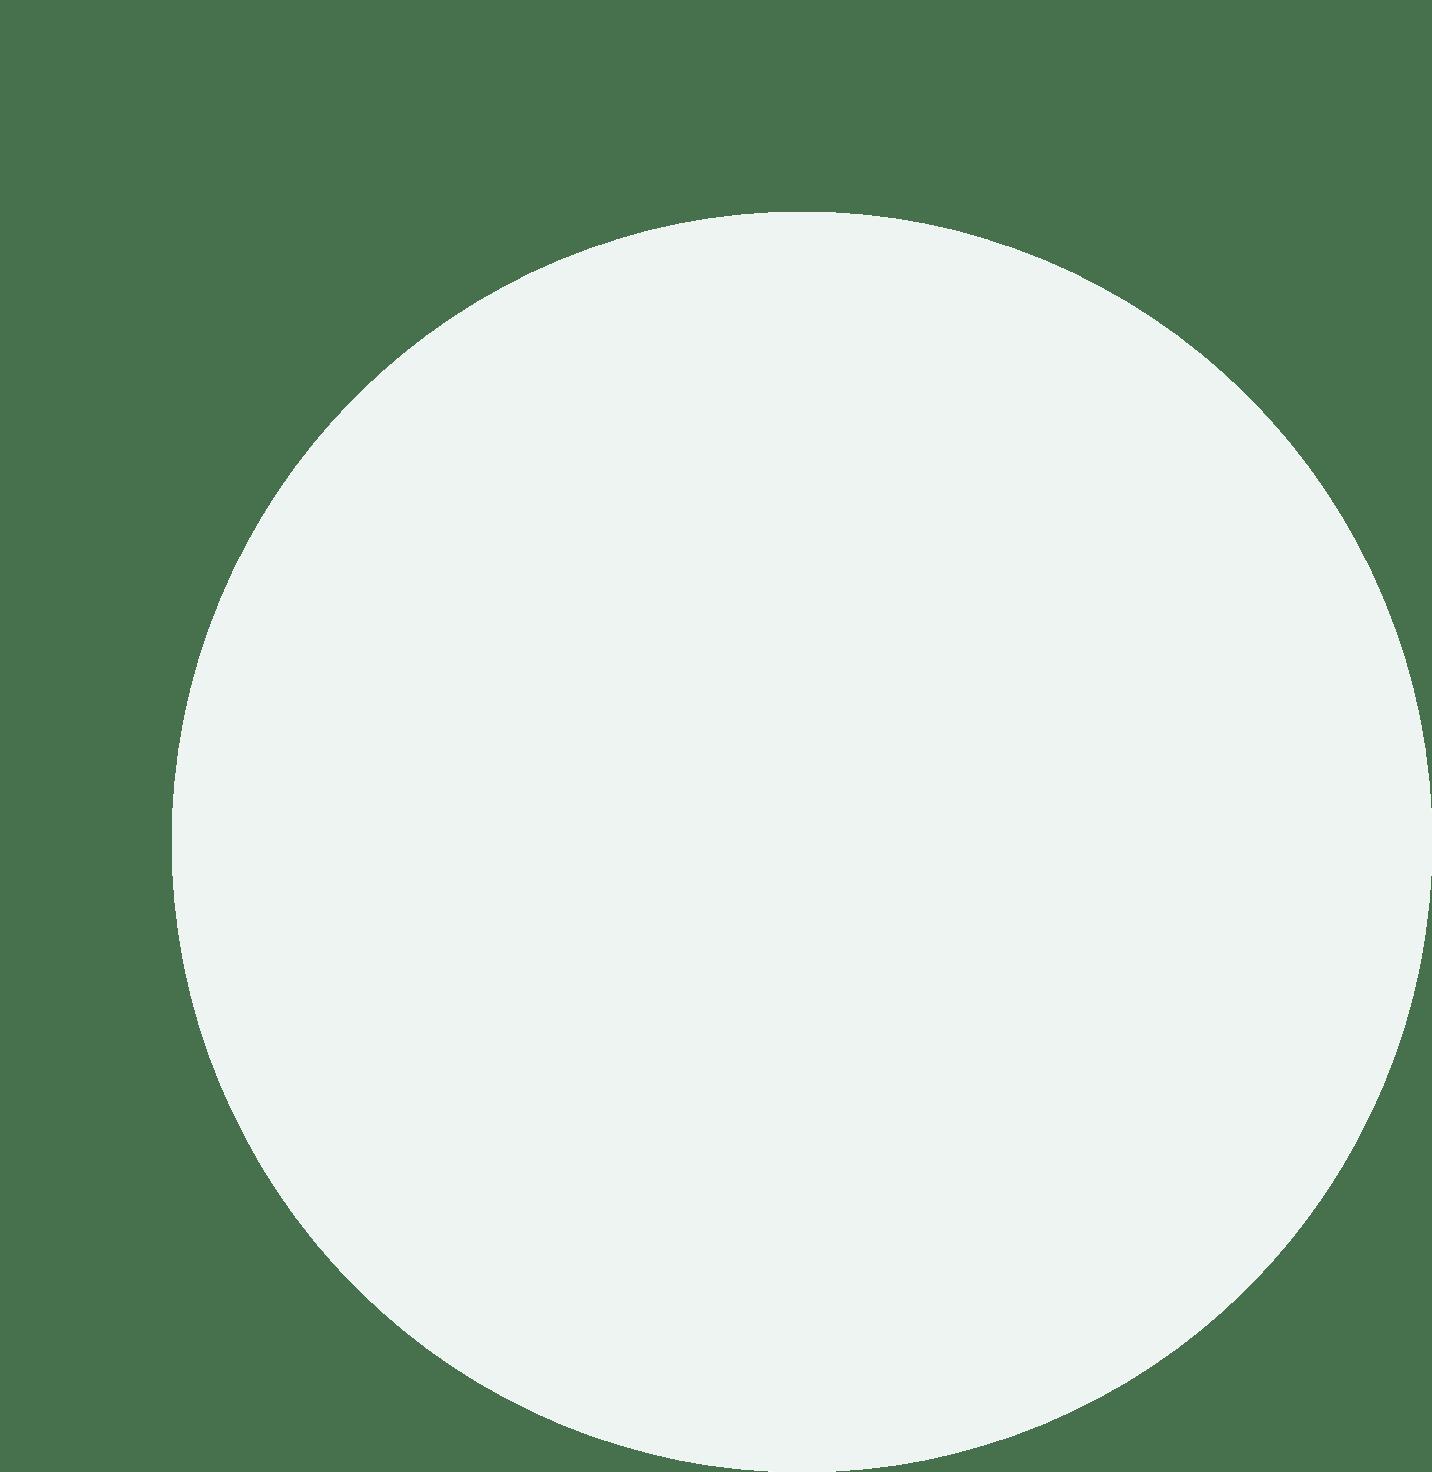 Circle-green-four-min